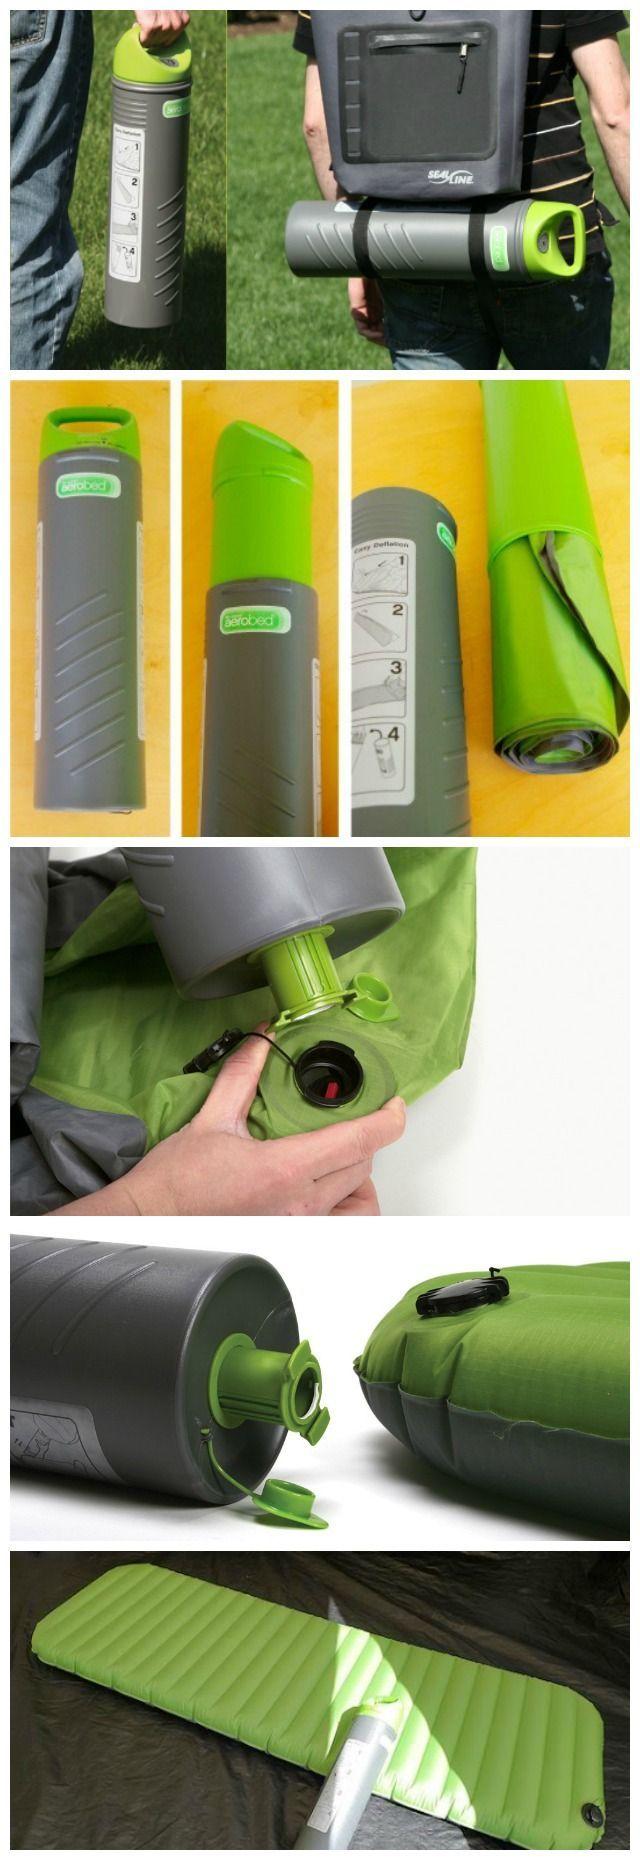 AeroBed PakMat with Hand Pump Camping supplies, Camping